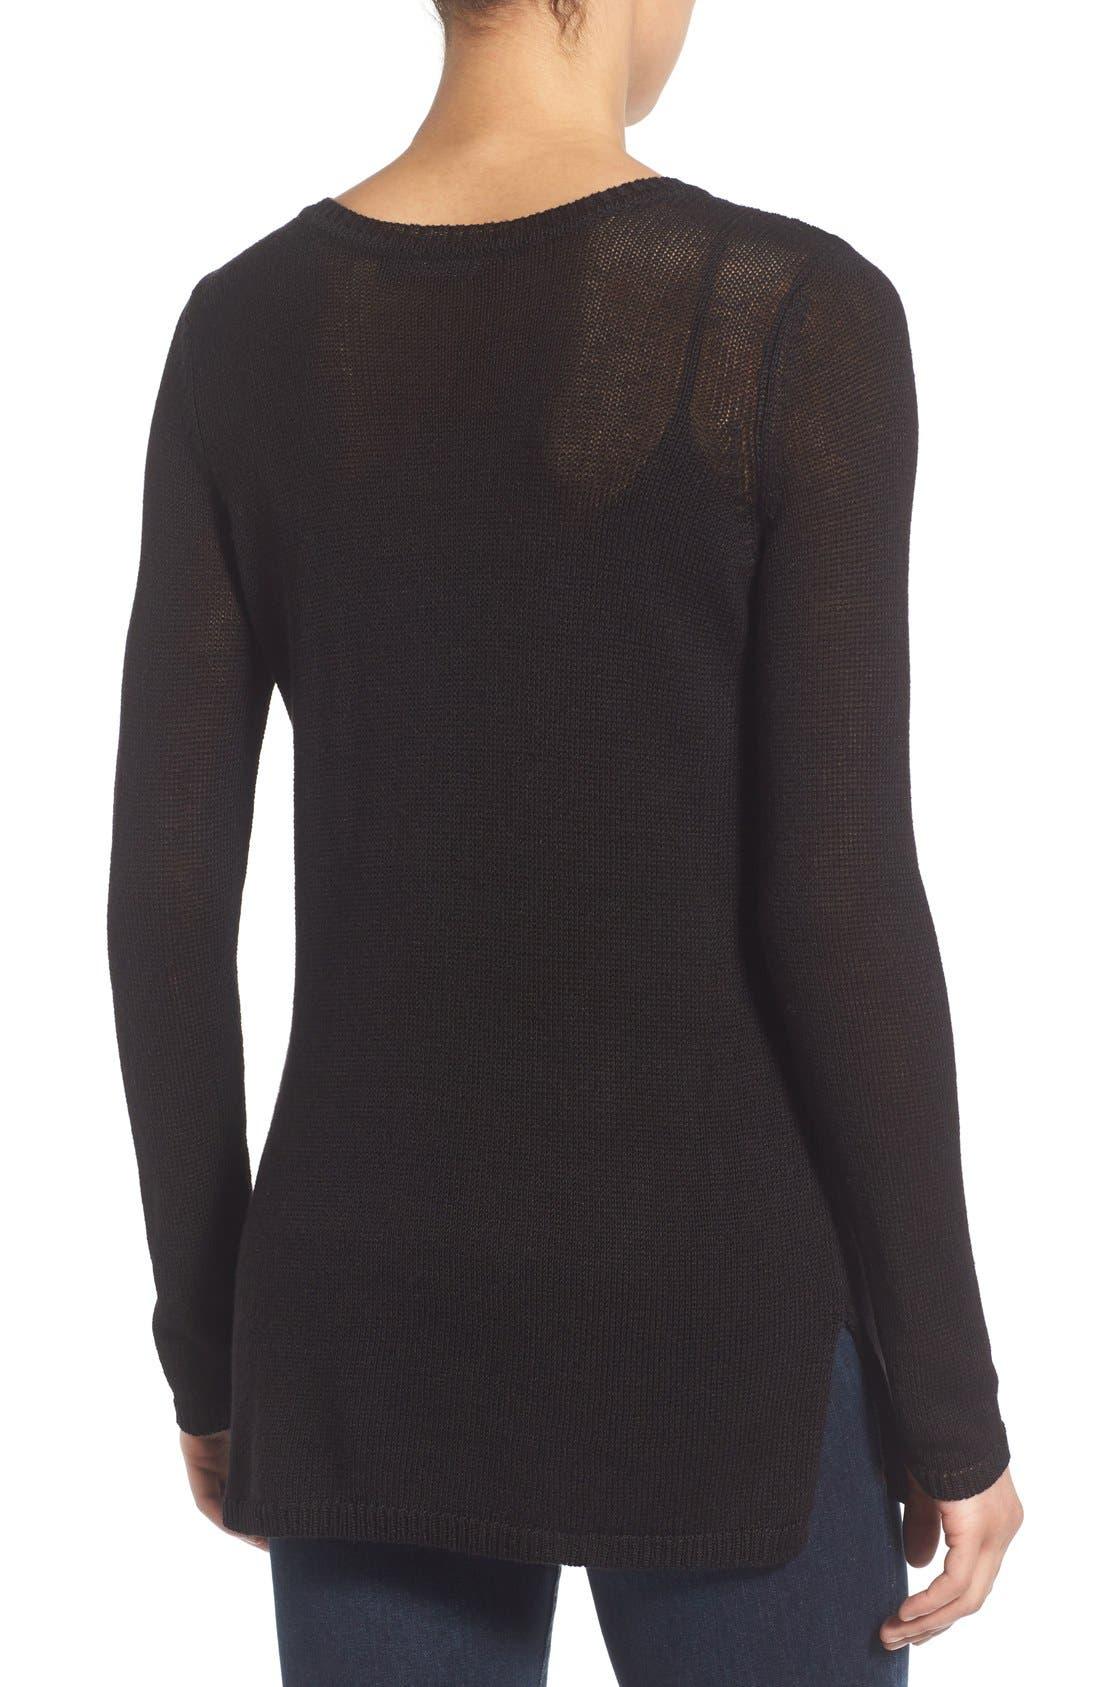 Alternate Image 3  - NIC+ZOE 'Speared' Print Lightweight Sweater